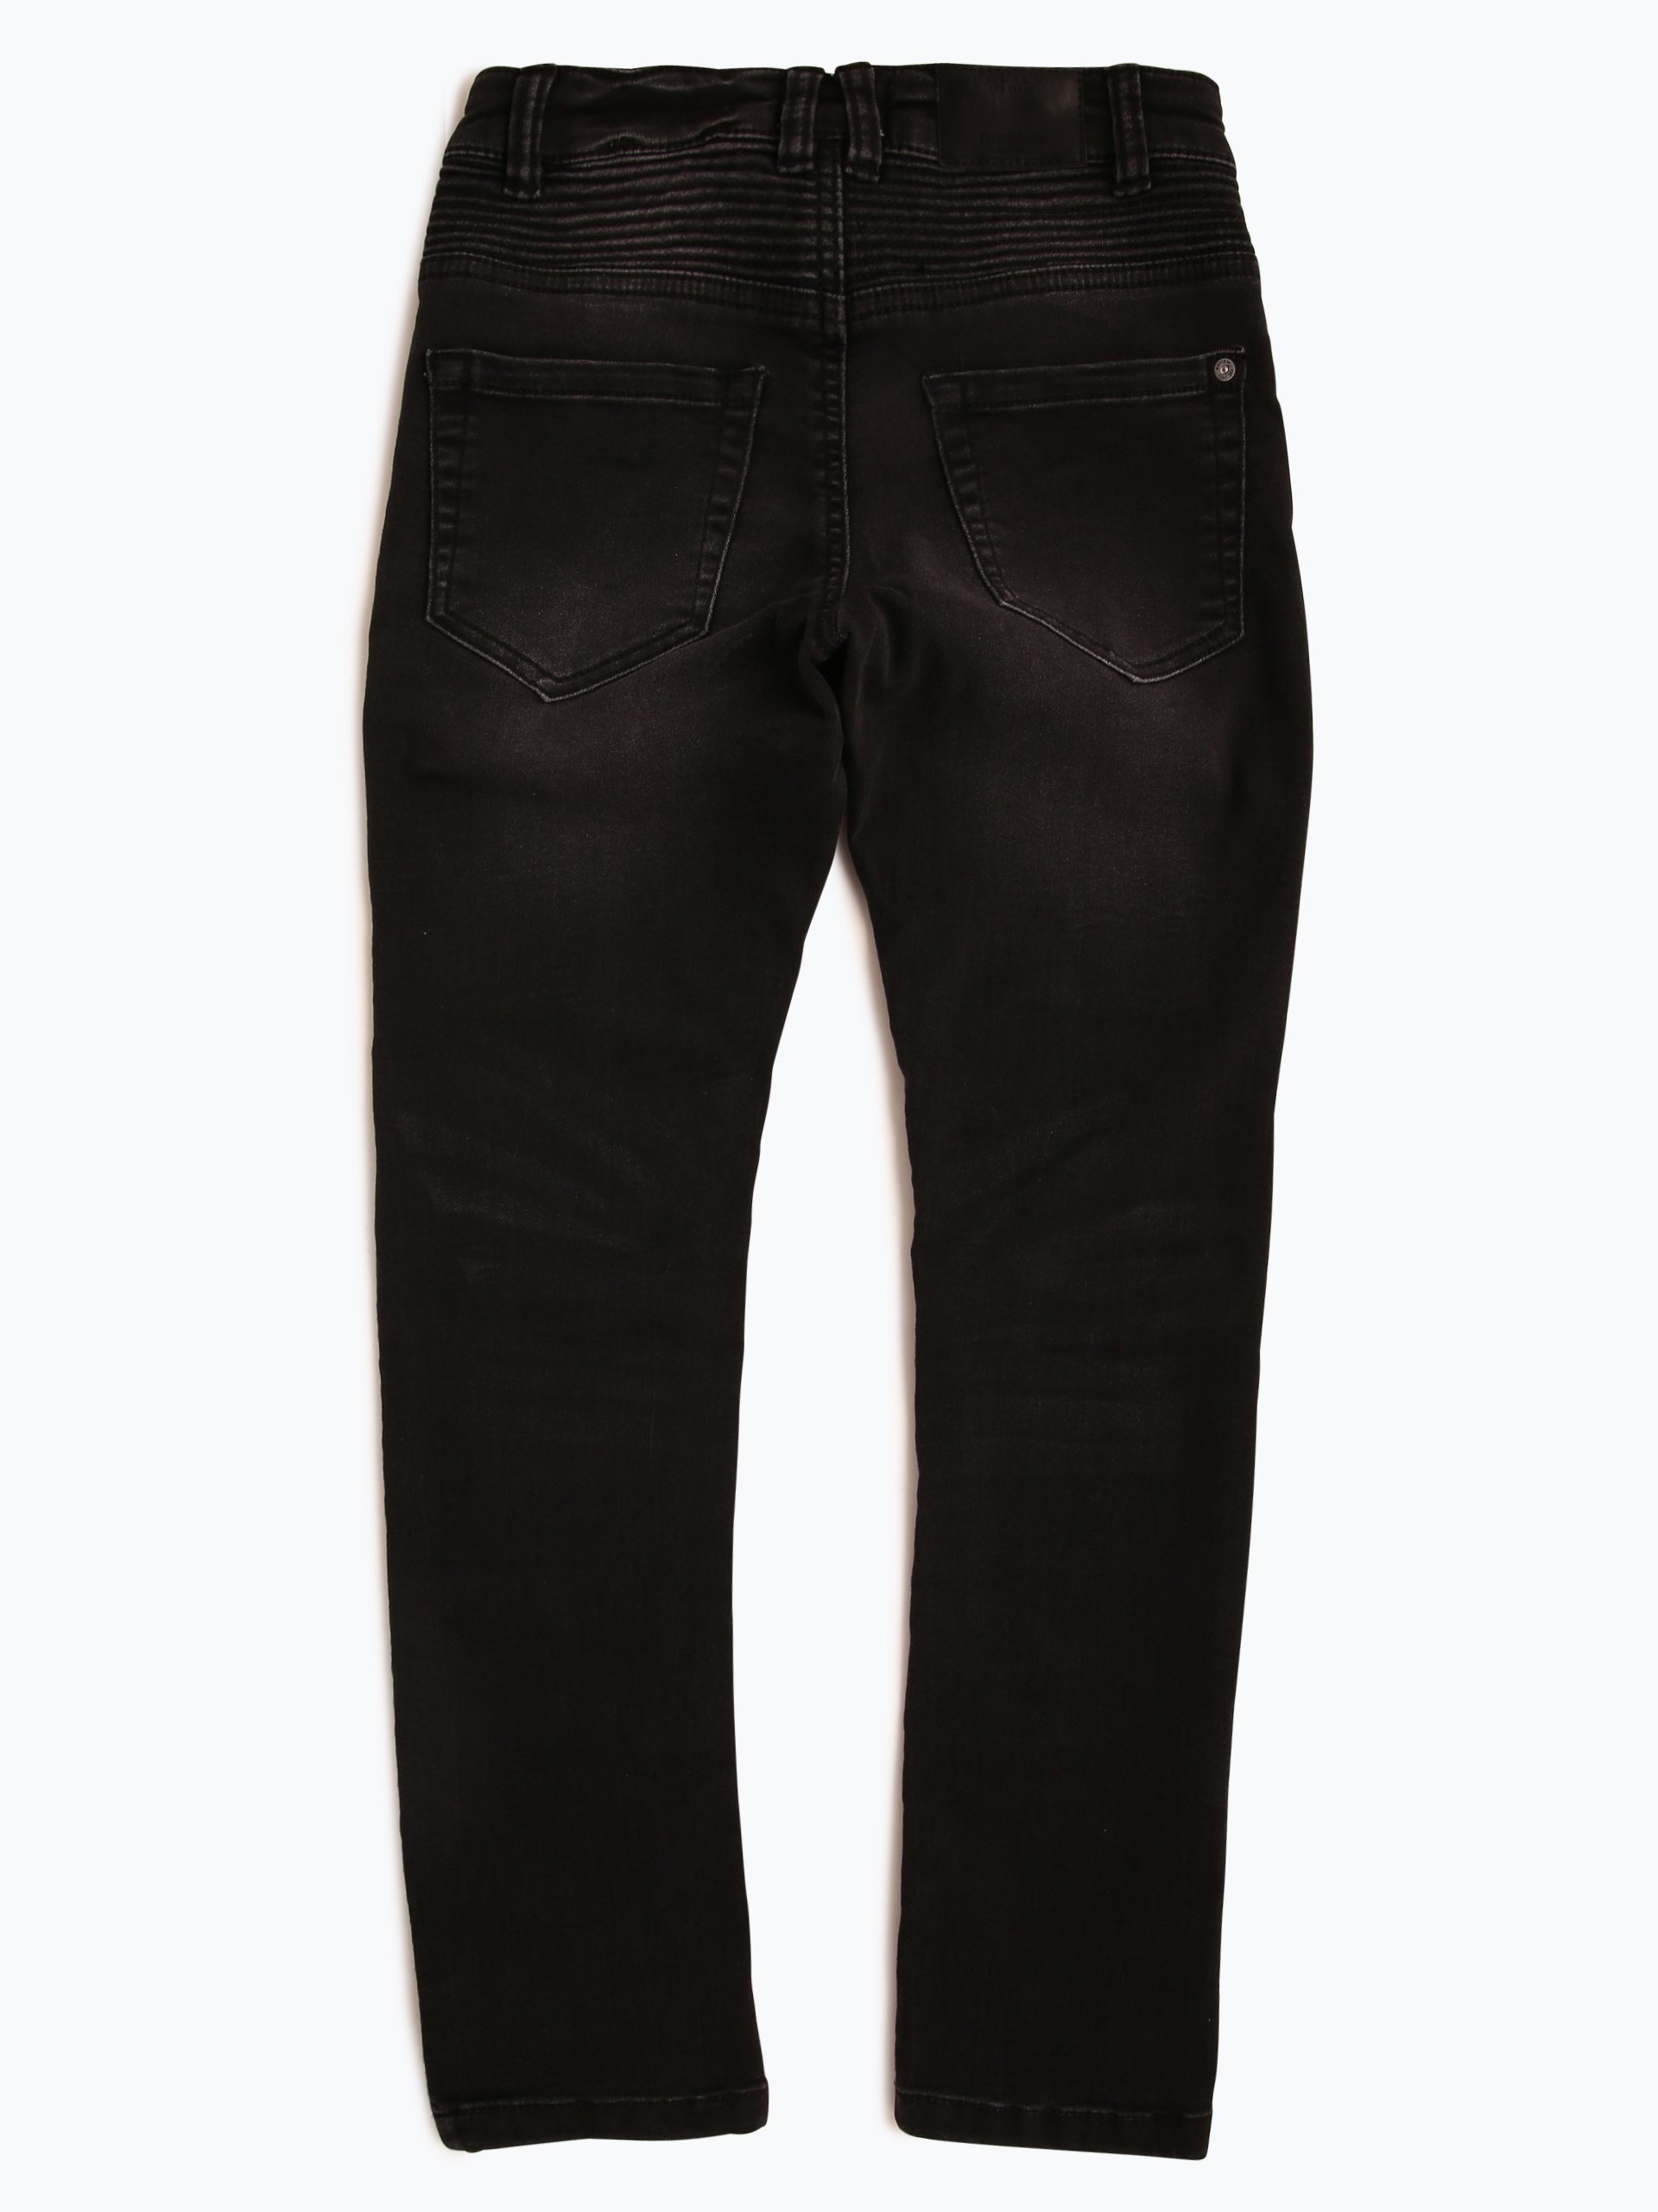 review jungen jeans slim fit schwarz uni online kaufen. Black Bedroom Furniture Sets. Home Design Ideas